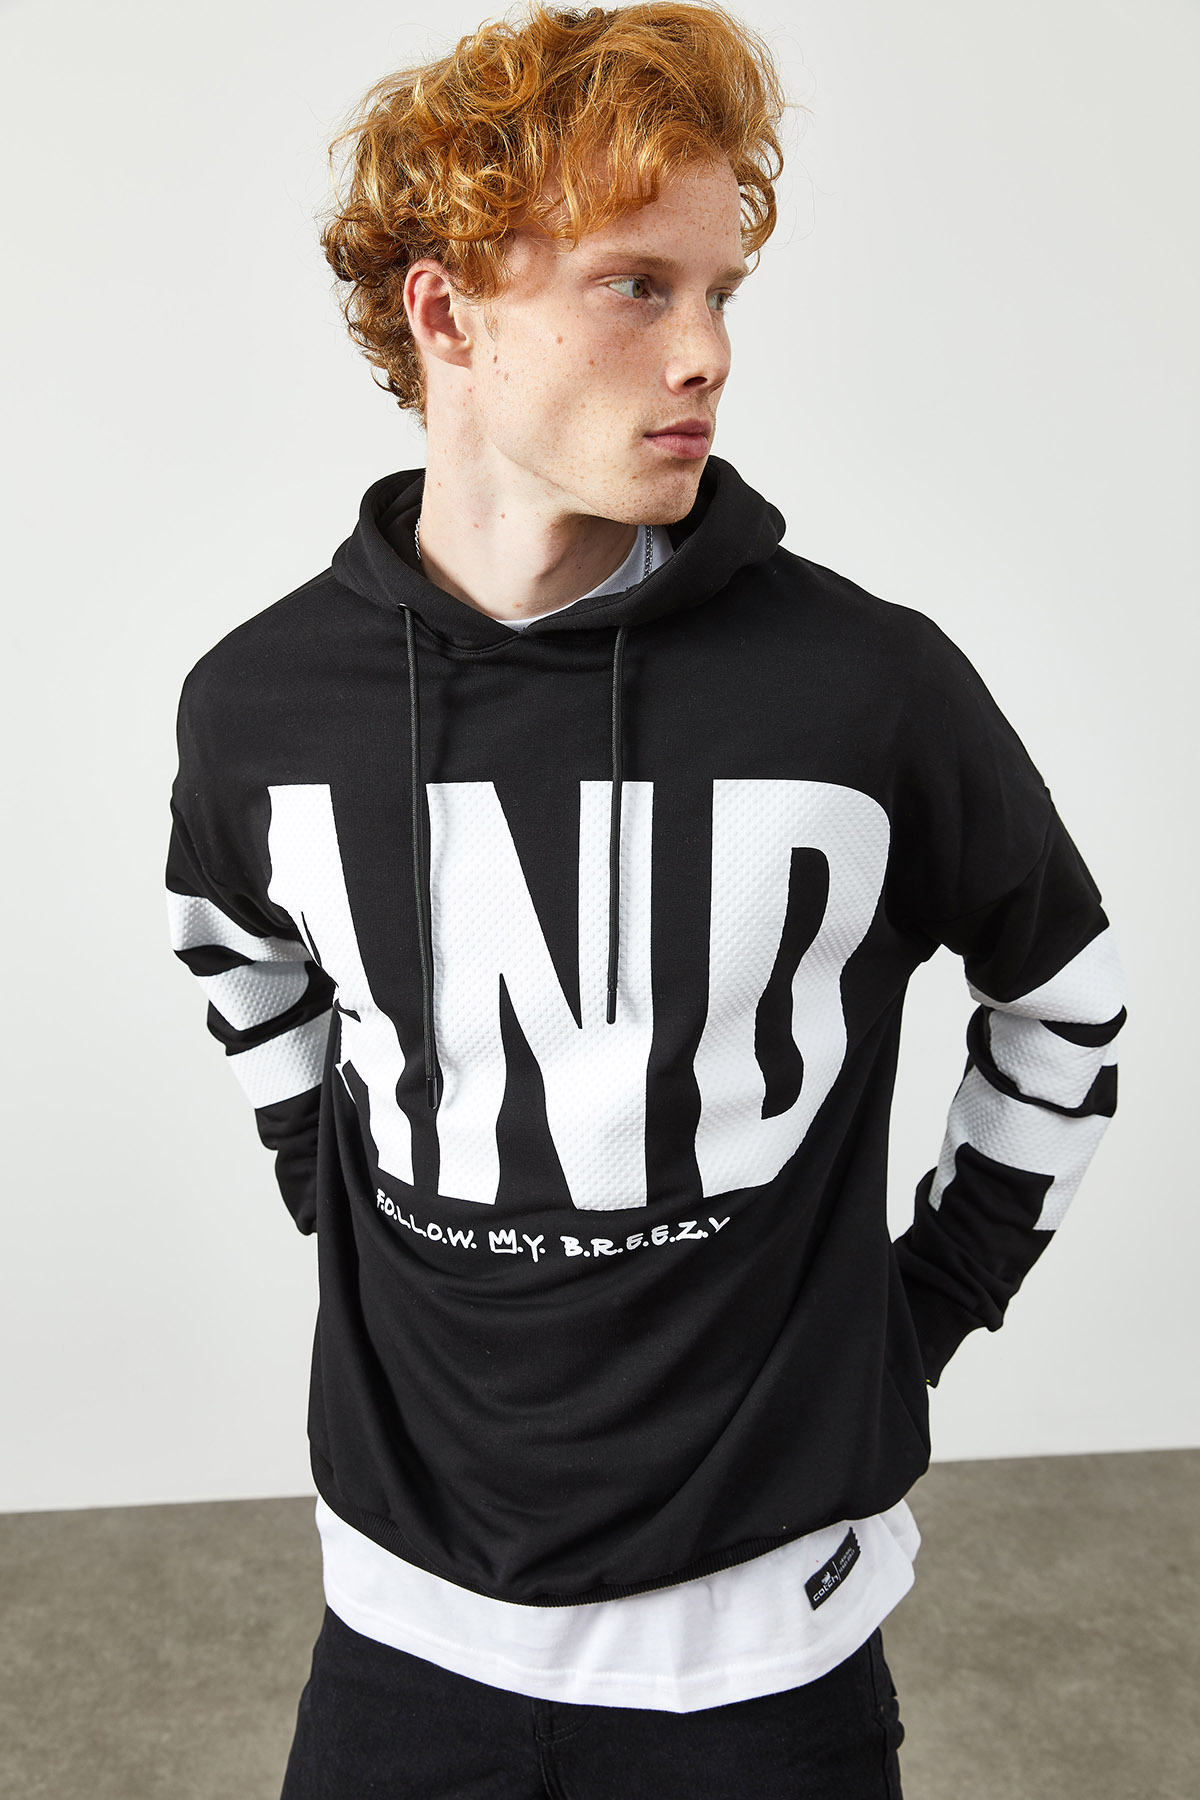 Siyah Baskılı Kapüşonlu Sweatshirt 2KXE8-45372-02